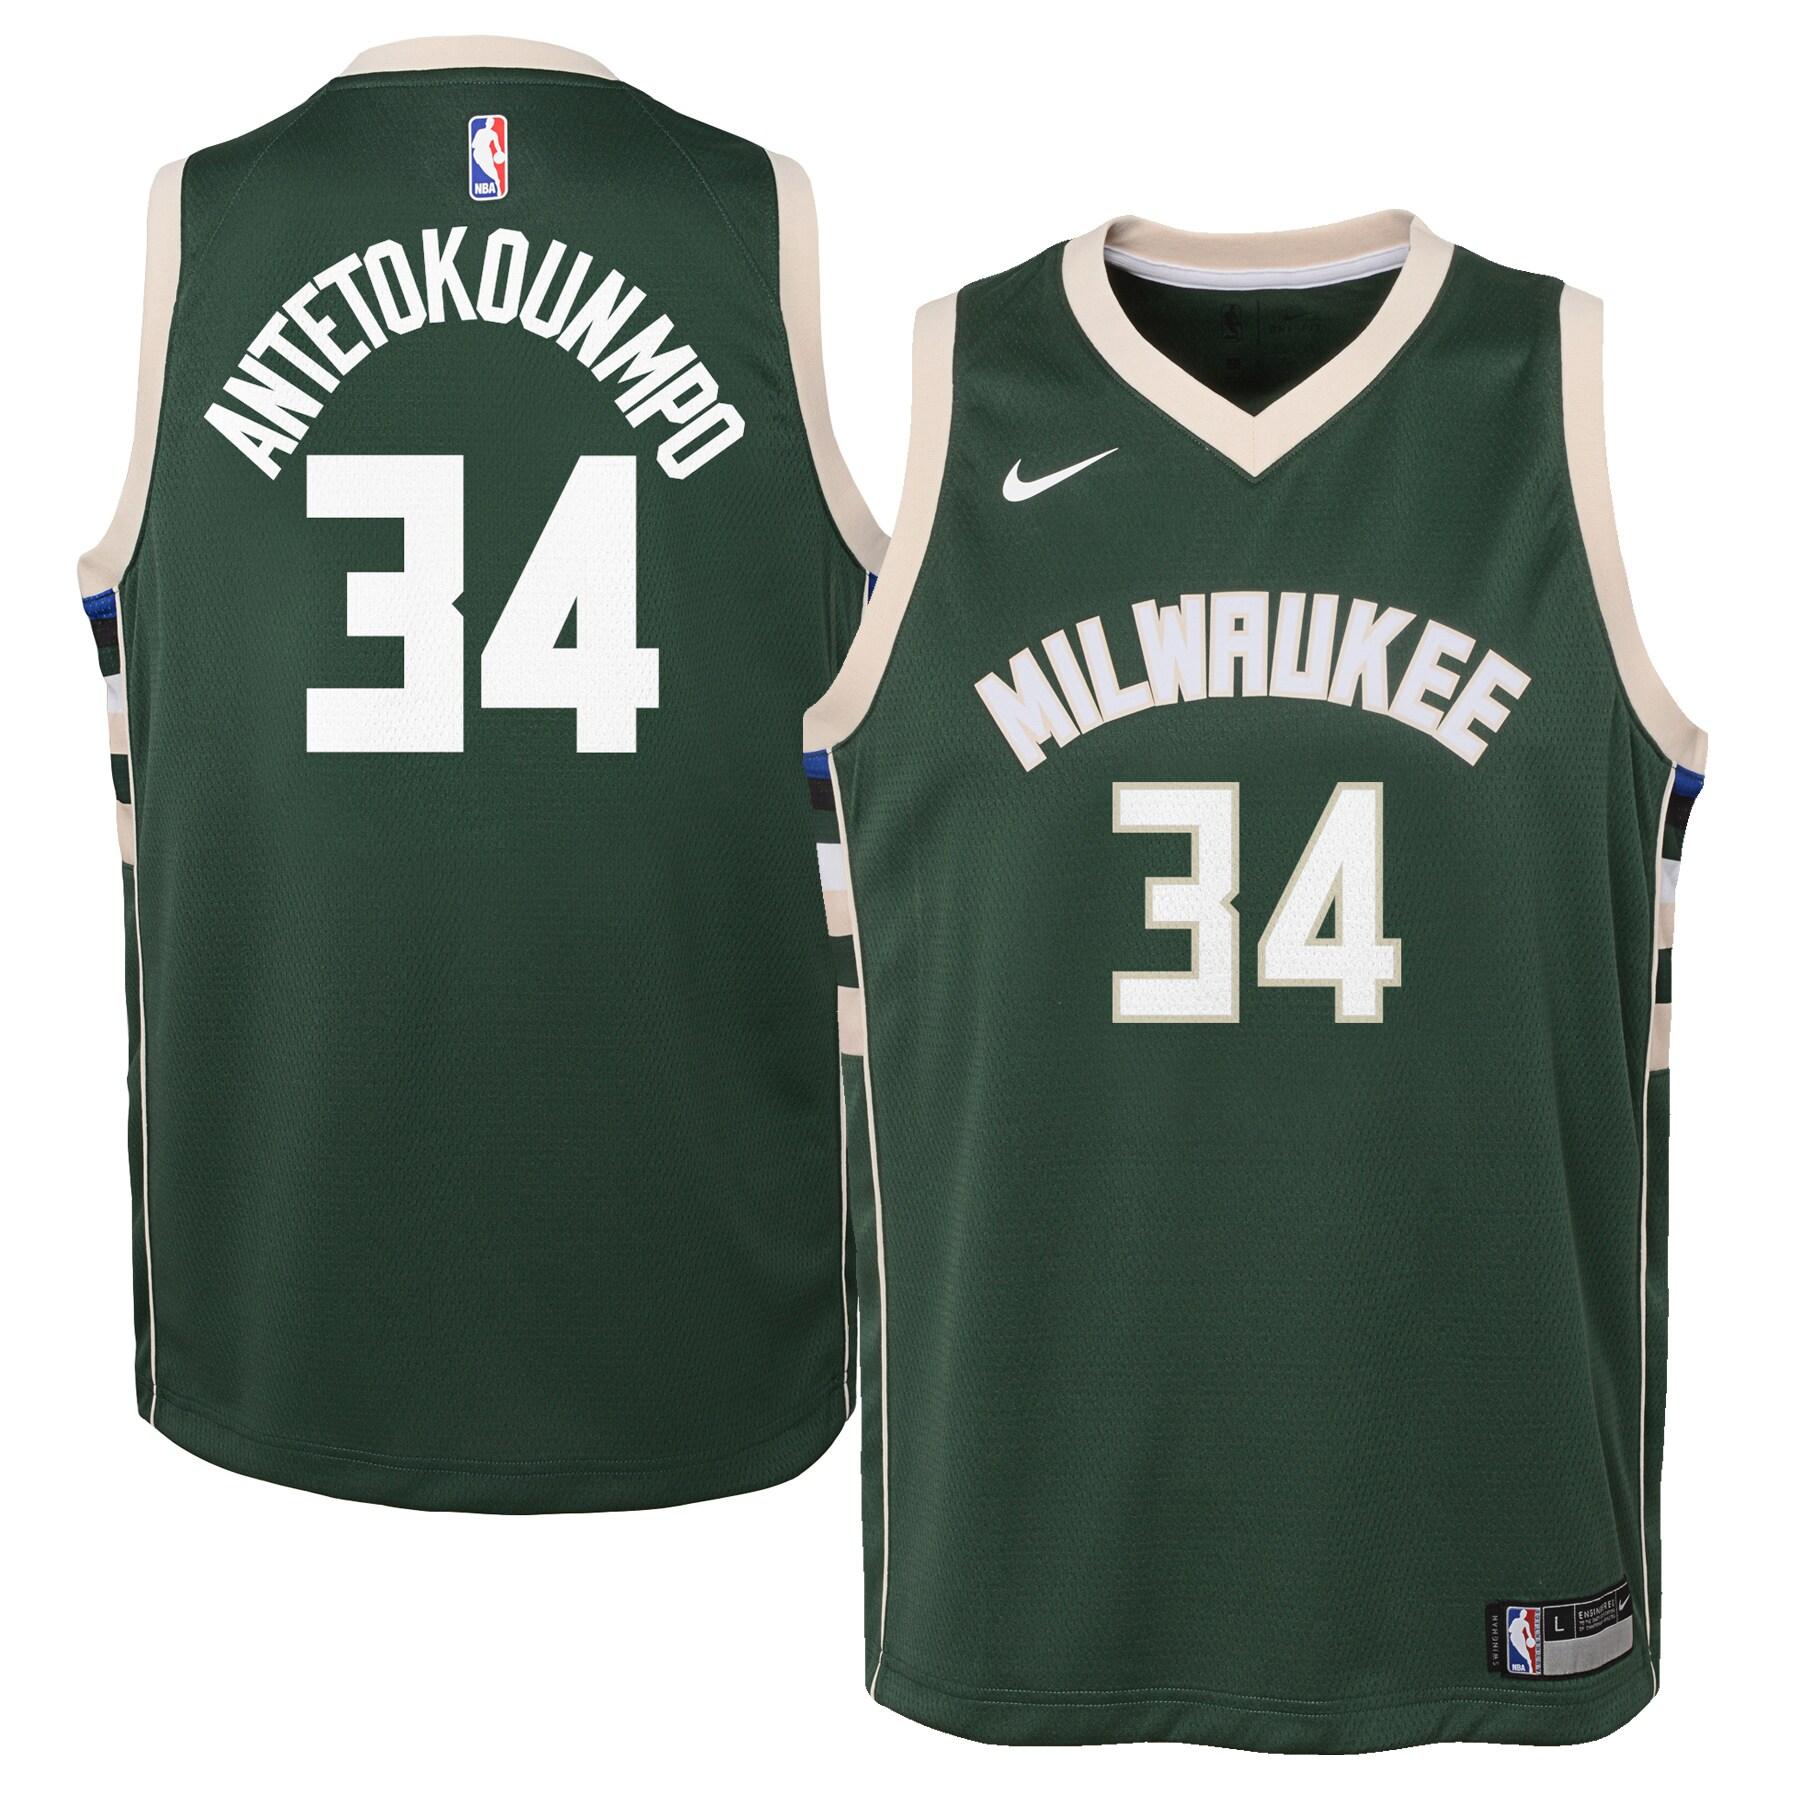 Giannis Antetokounmpo Milwaukee Bucks Nike Youth Swingman Jersey Green - Icon Edition